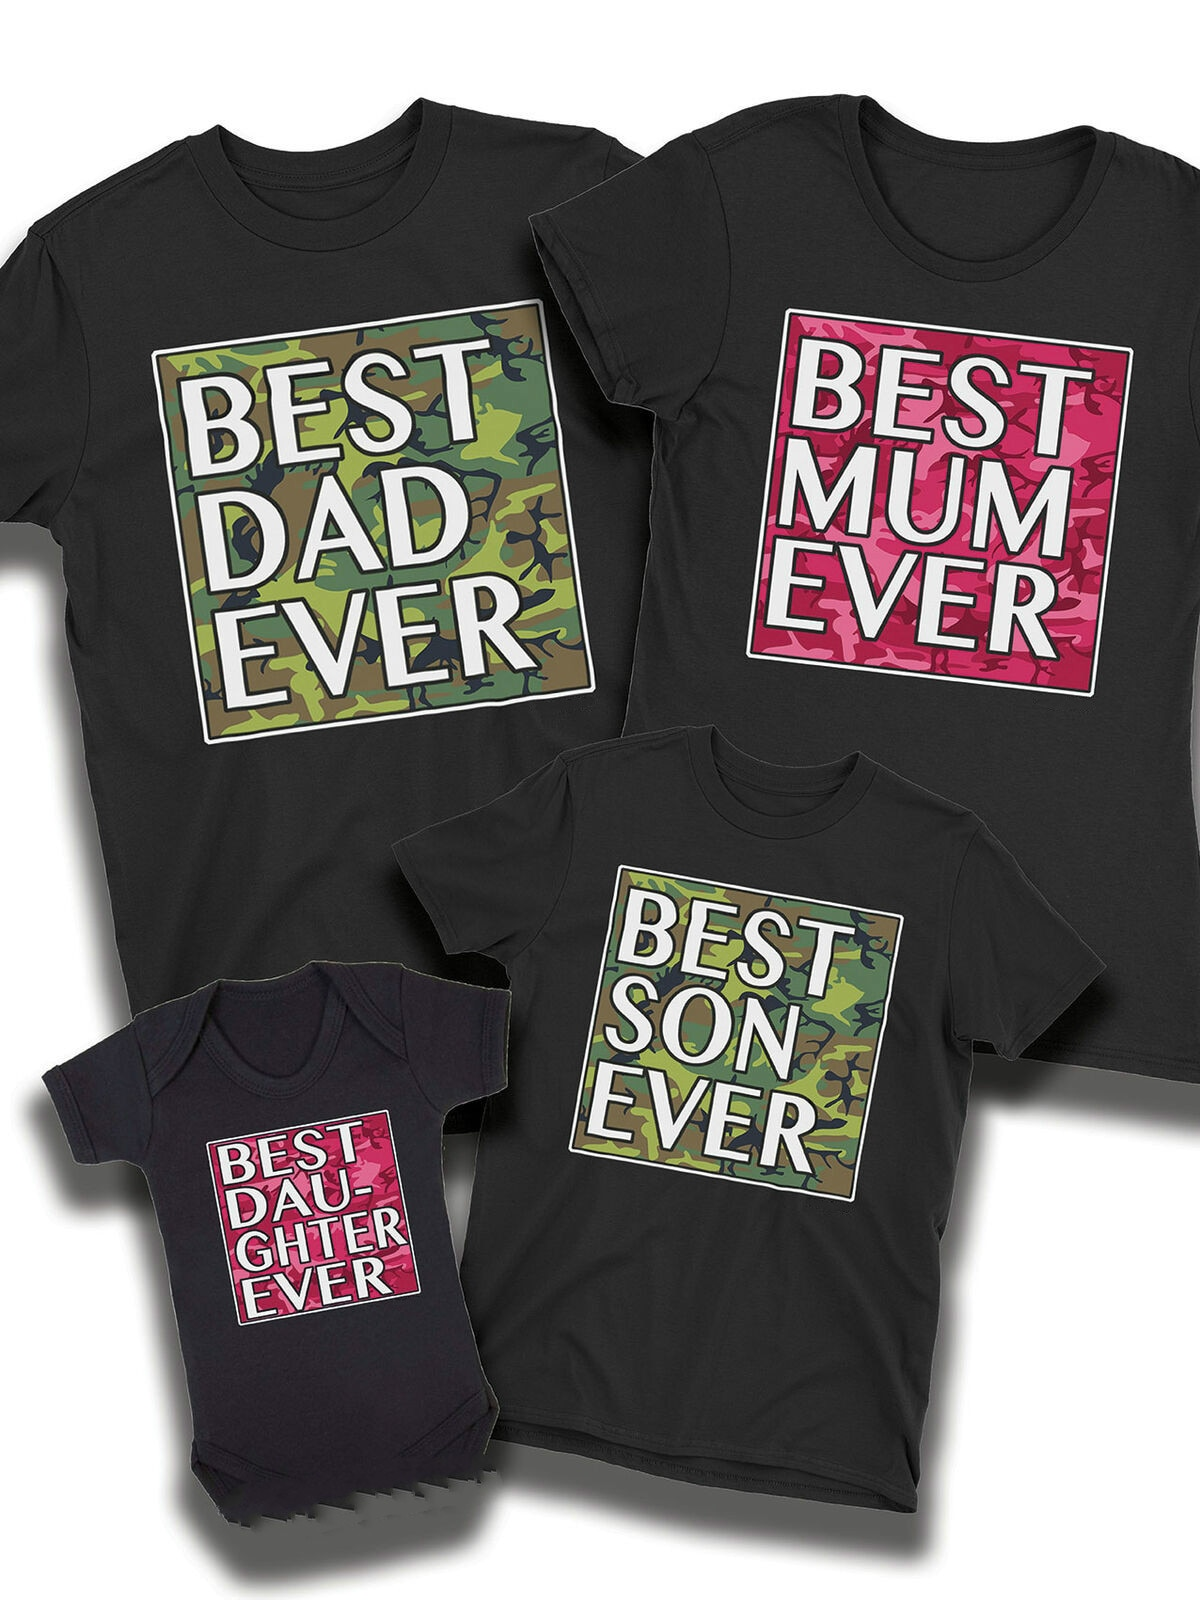 Best Dad Immer Camo T-Shirt Vater Mama Sohn Tochter Baby Familie Passenden Outfits Nette Geschenk